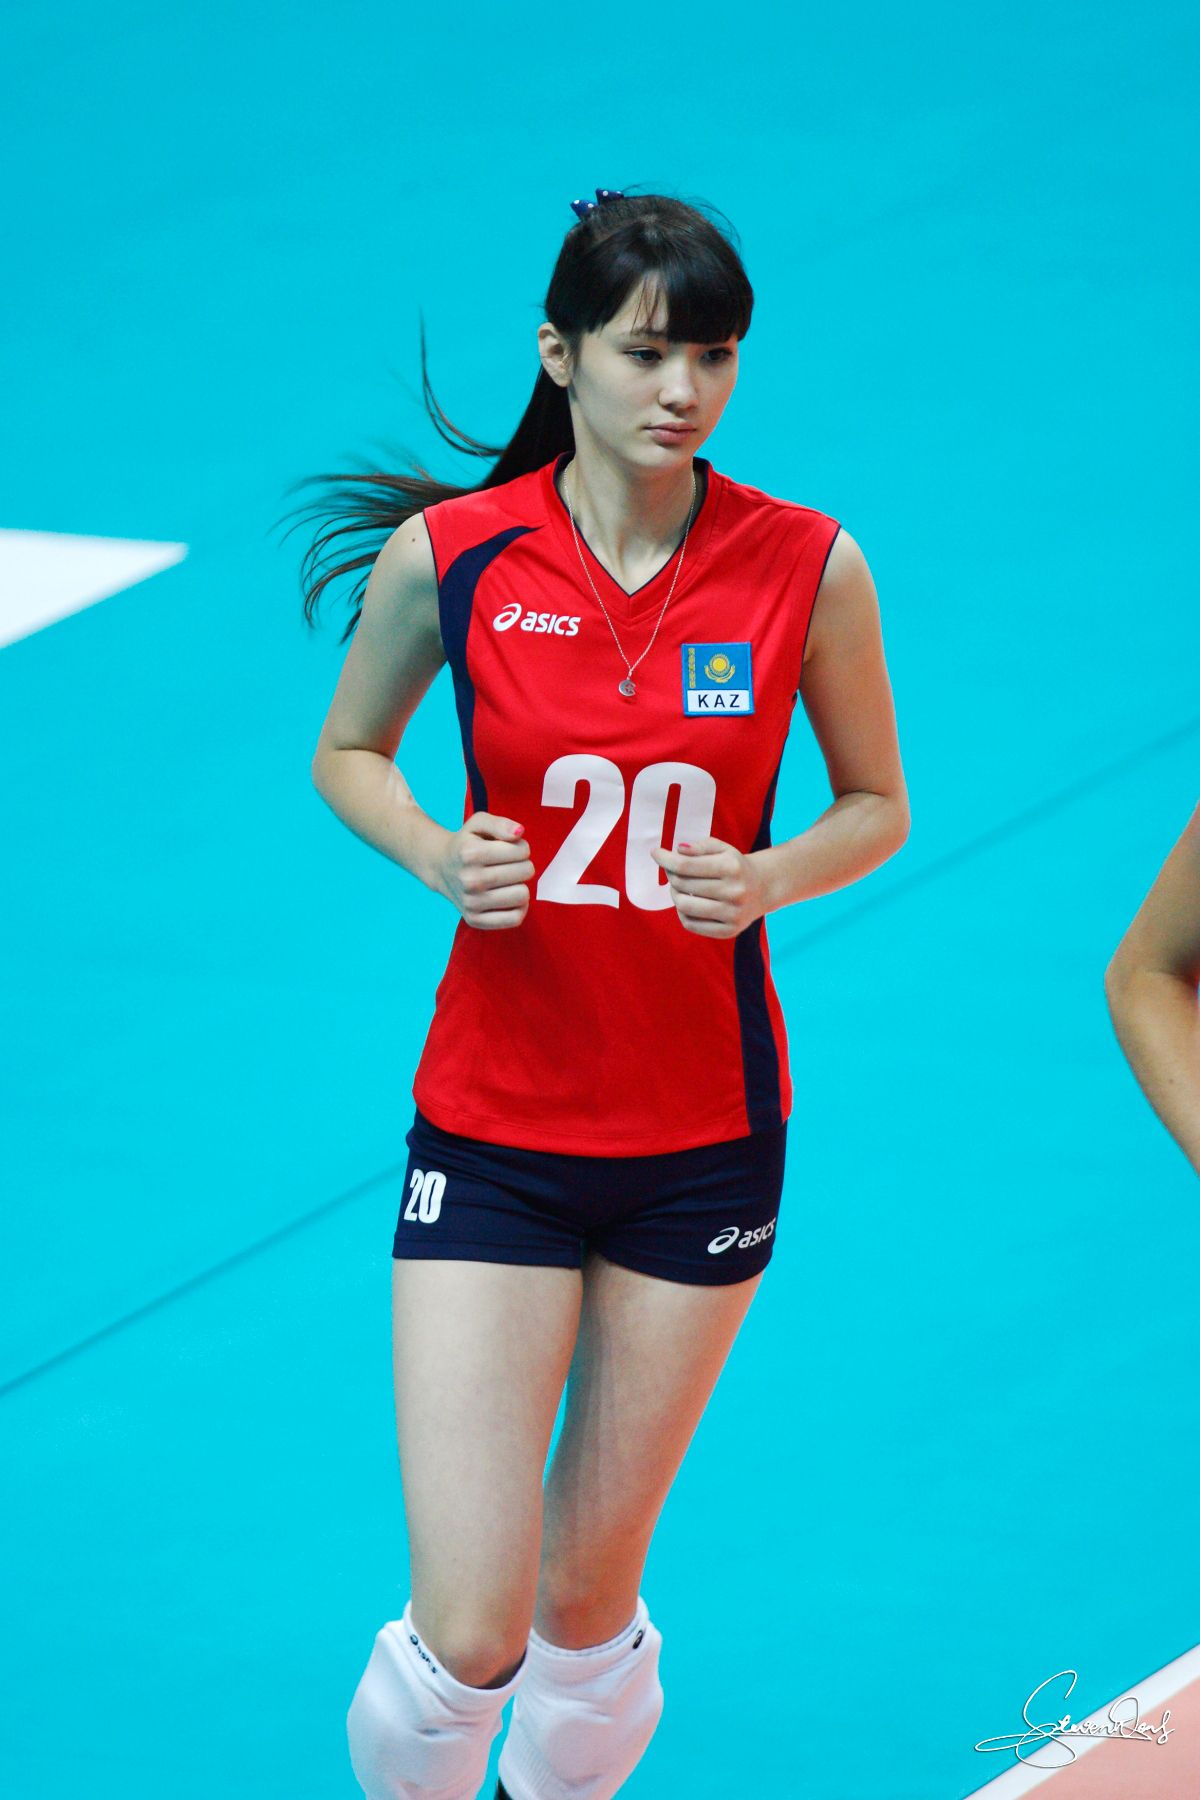 Sabina Altynbekova Volleyball Player Beautiful Athletes Women Volleyball Female Athletes